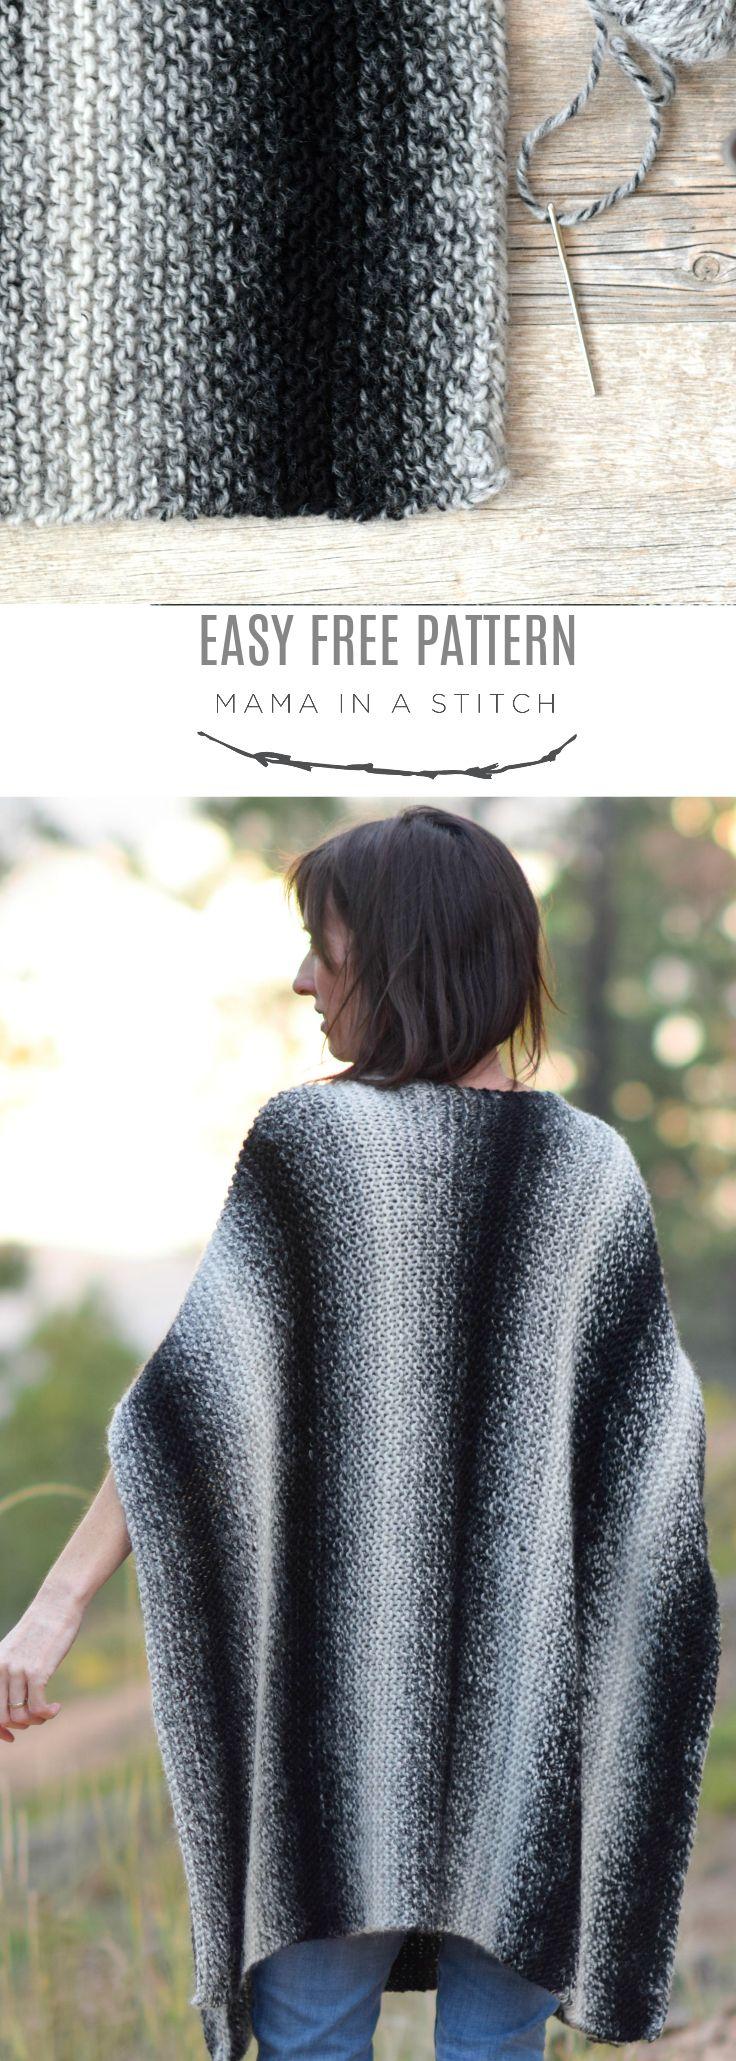 Aspen Relaxed Knit Poncho Pattern via @MamaInAStitch